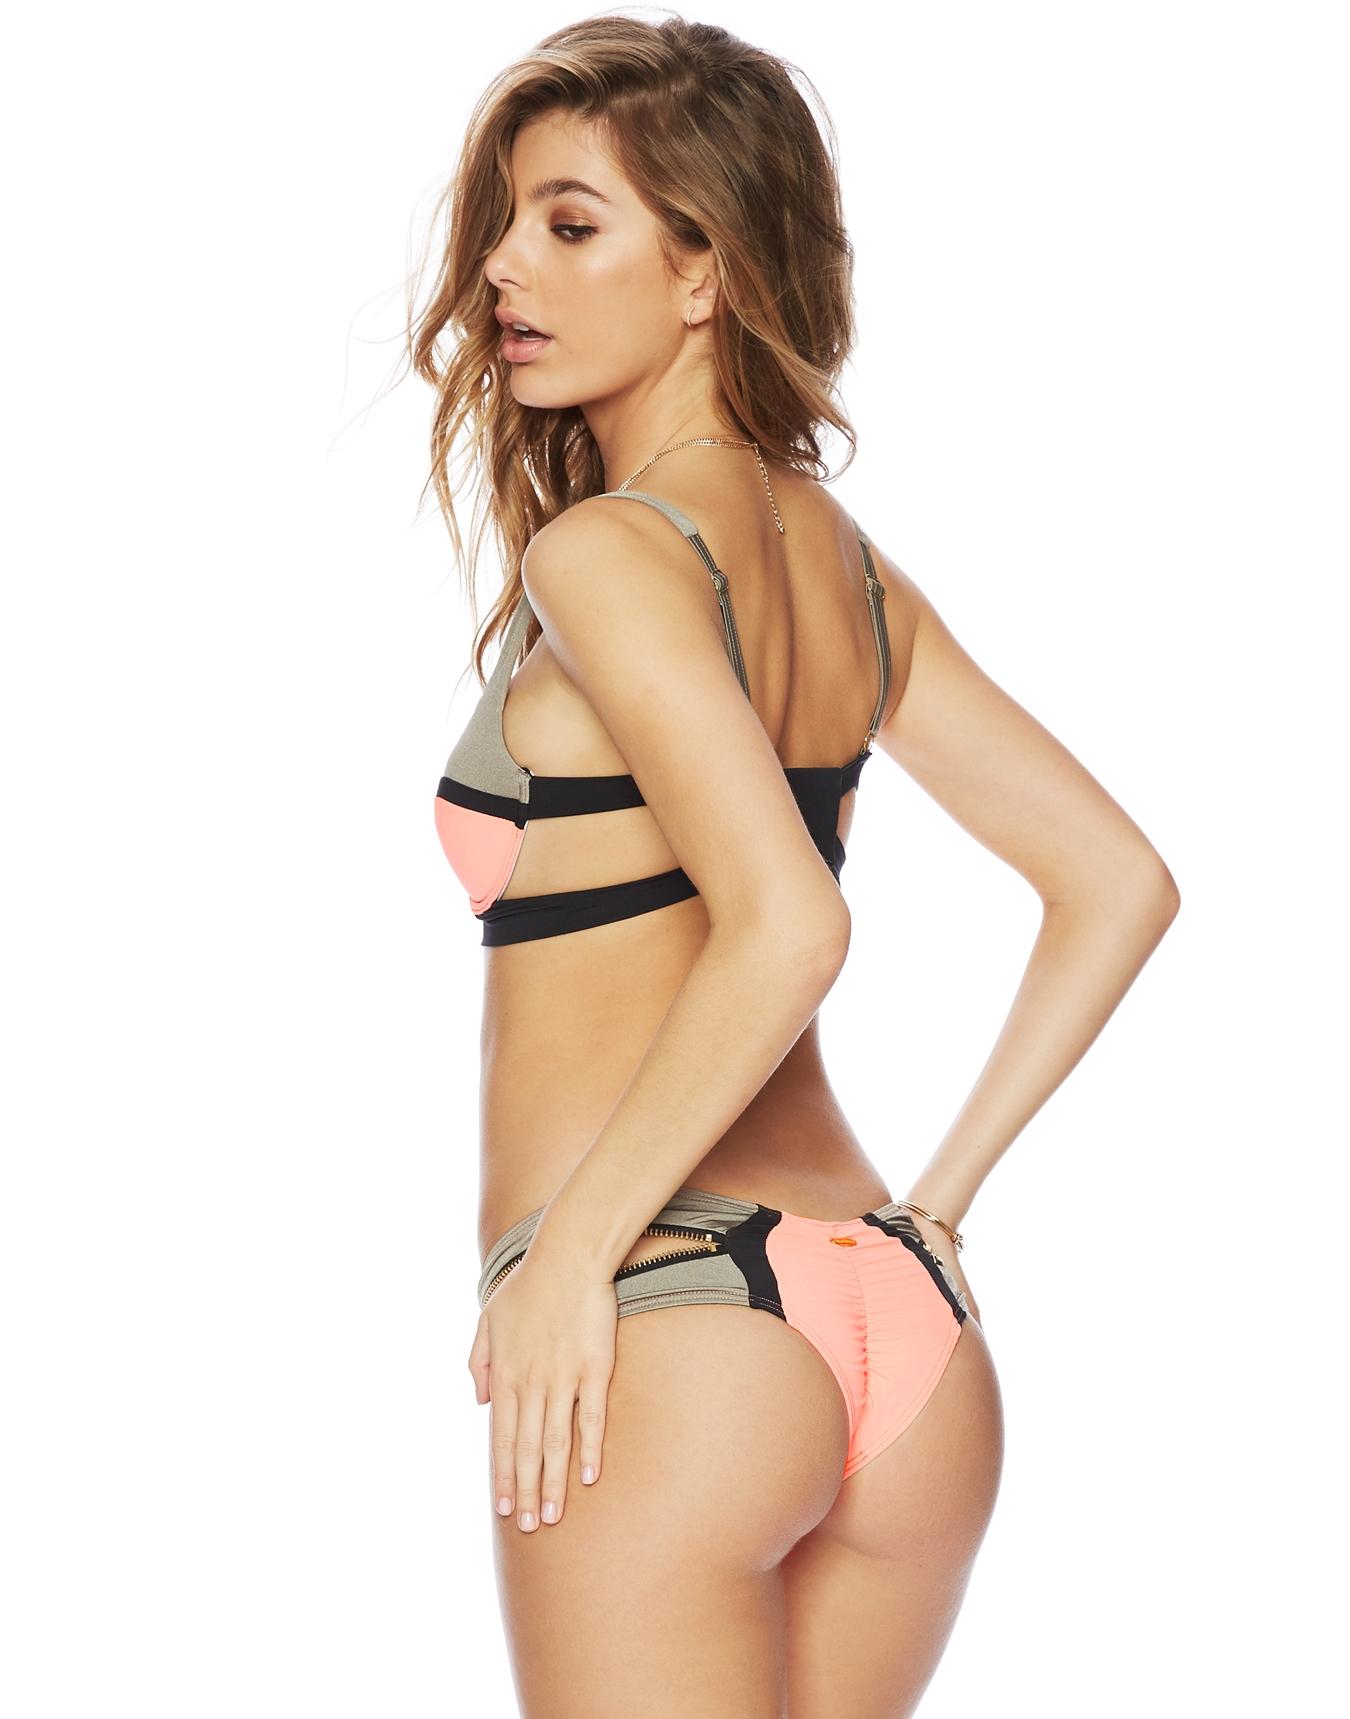 Camila Morrone in lingerie - ass